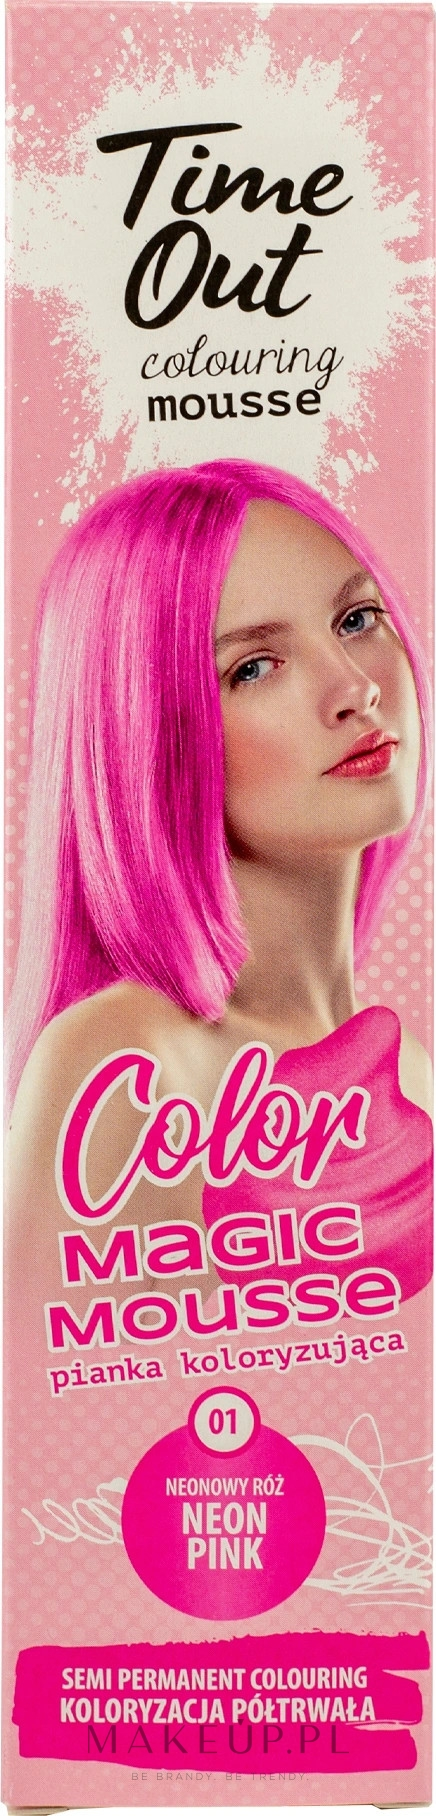 Pianka koloryzująca do włosów - Time Out Color Magic Mousse — фото 01 - Neon Pink